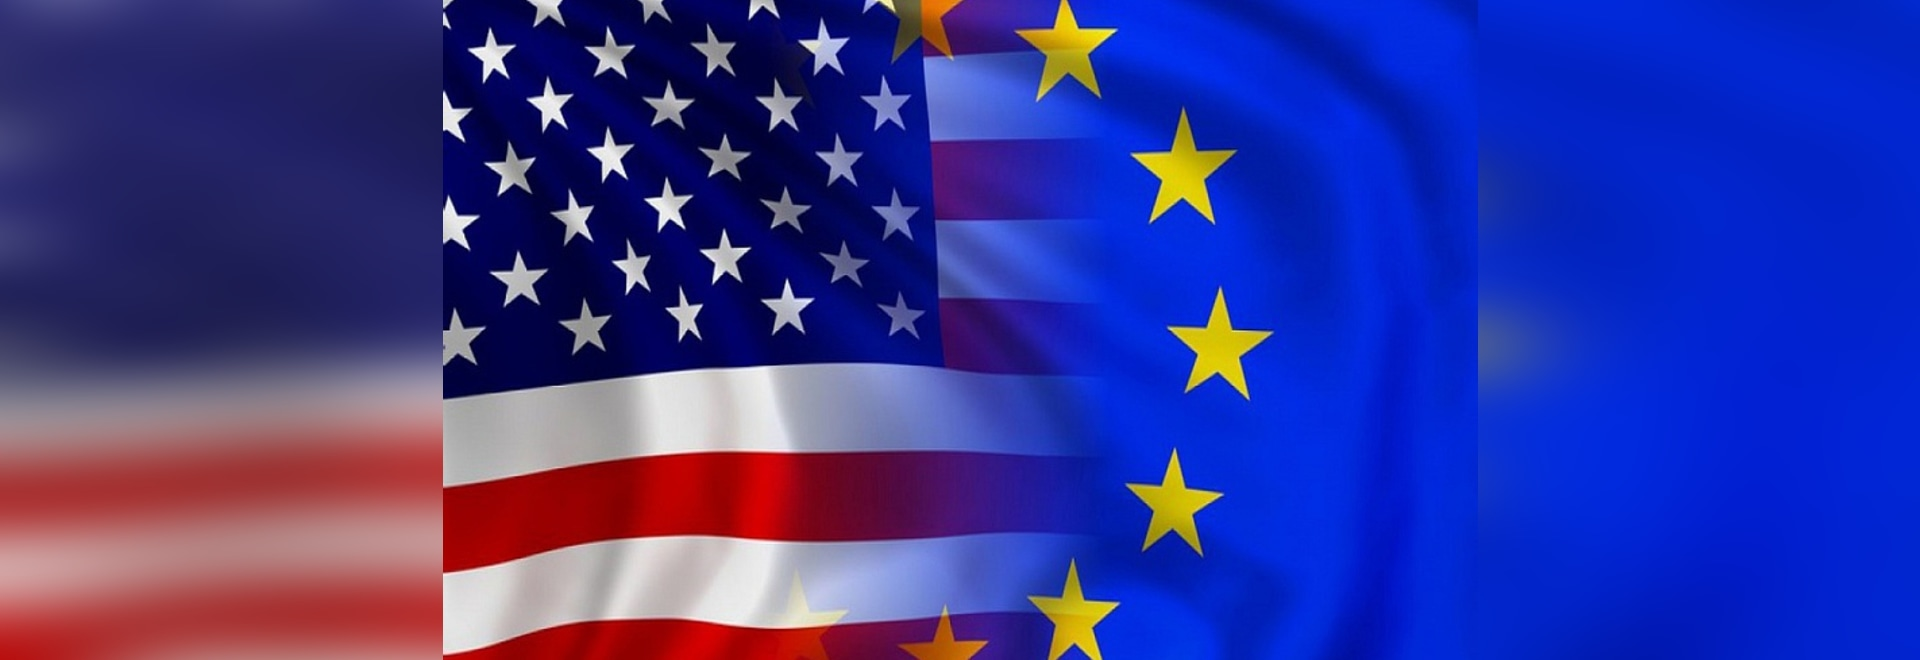 Beschäftigen neue Daten-Gesetze EU